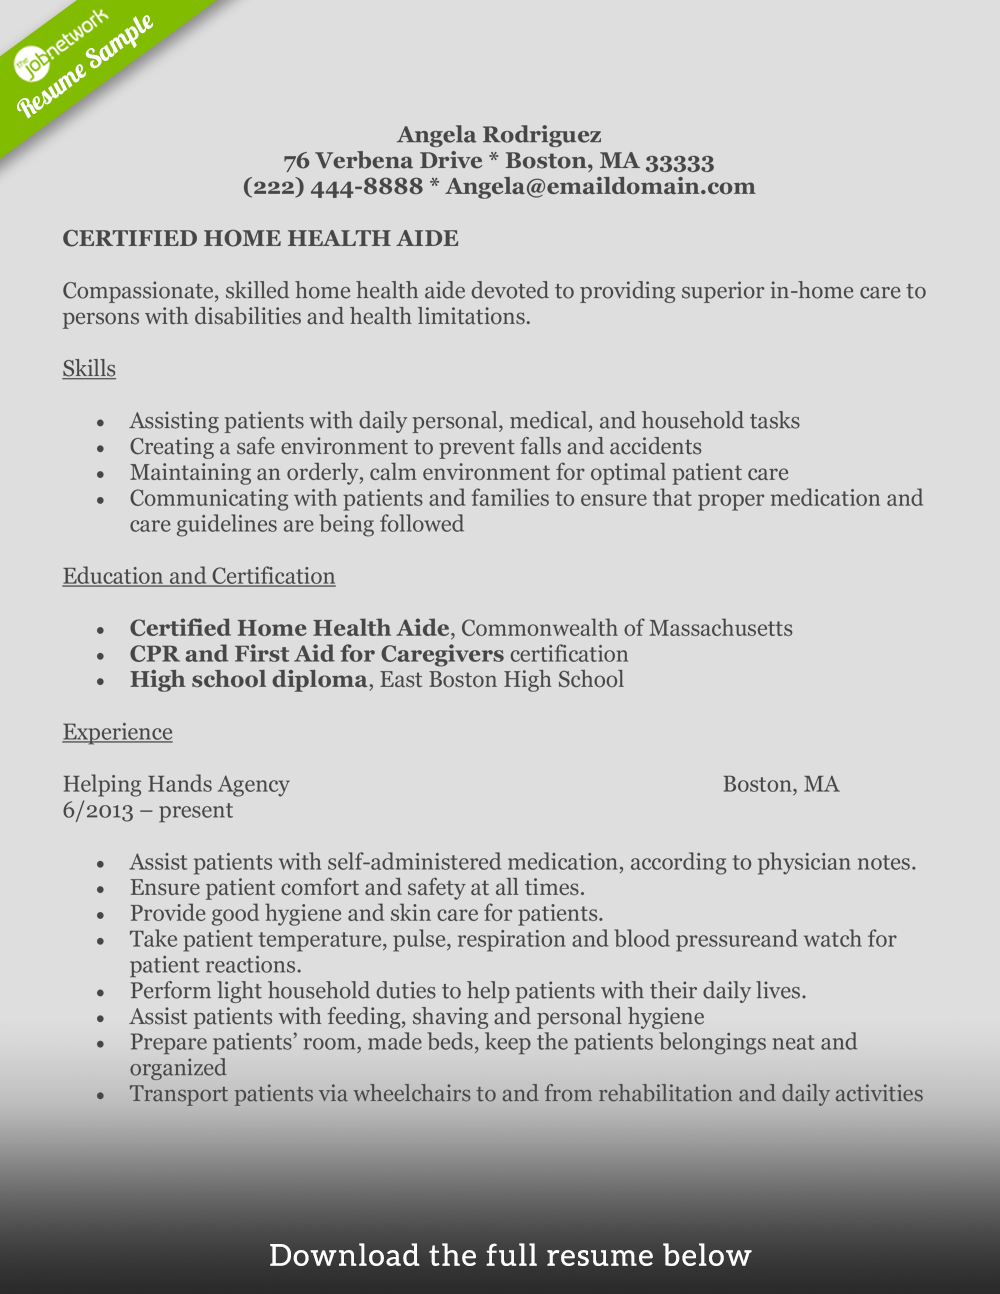 How To Write A Perfect Home Health Aide Resume Examples Included Home Health Aide Nurse Job Description Home Health Nurse